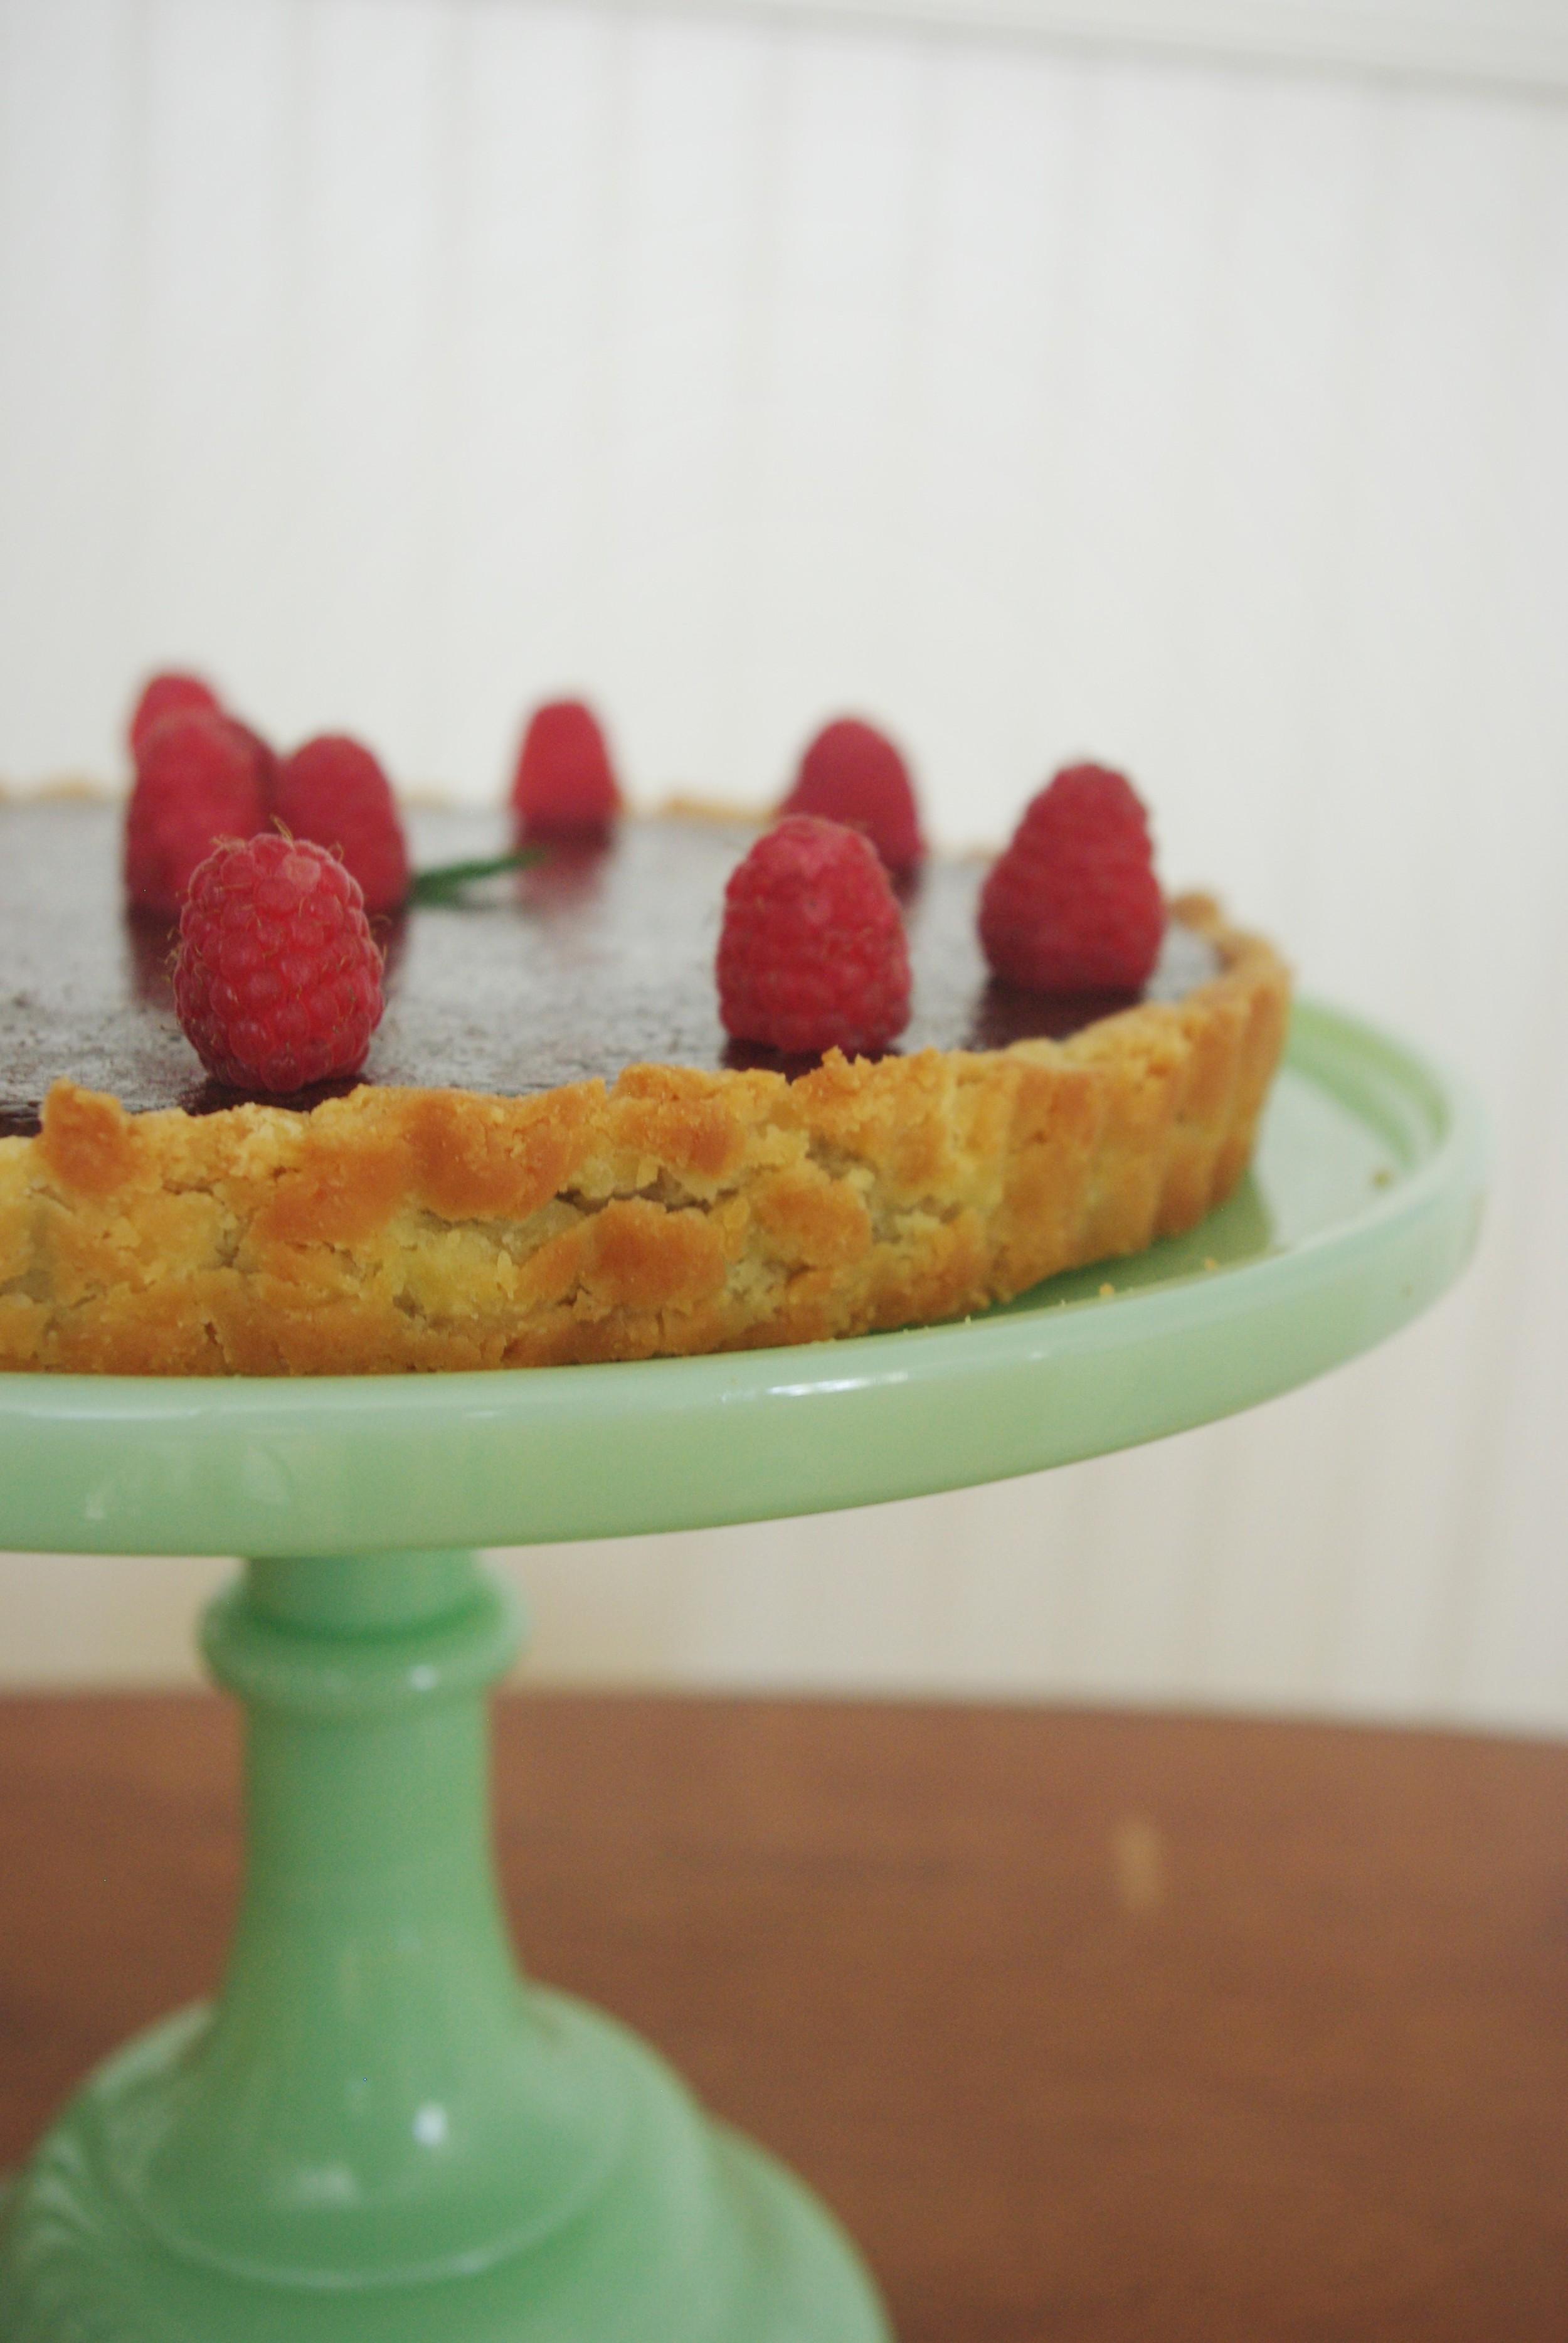 Chocolate Raspberry Tart with Shortbread Crust